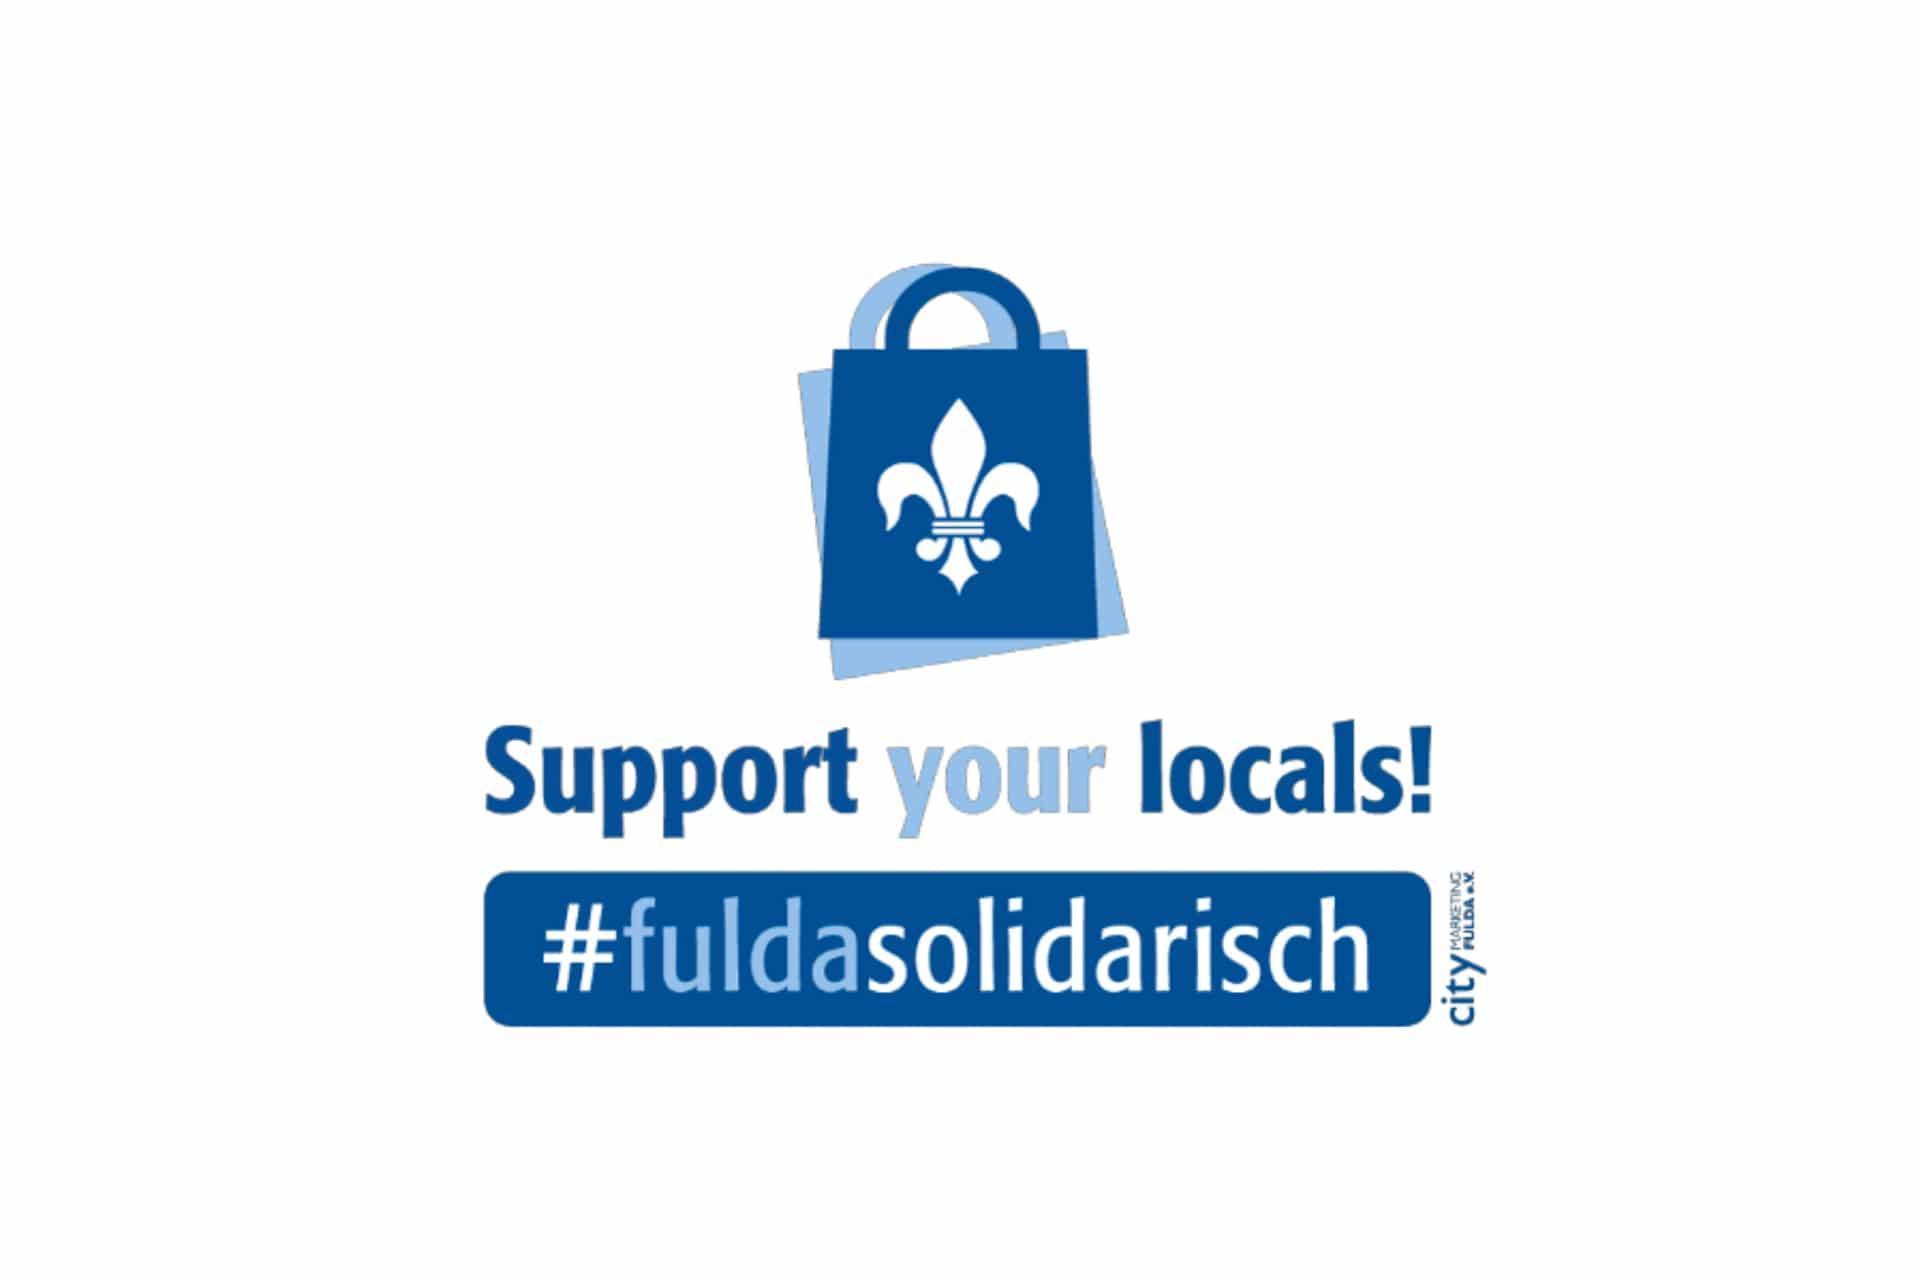 Support your locals Fulda